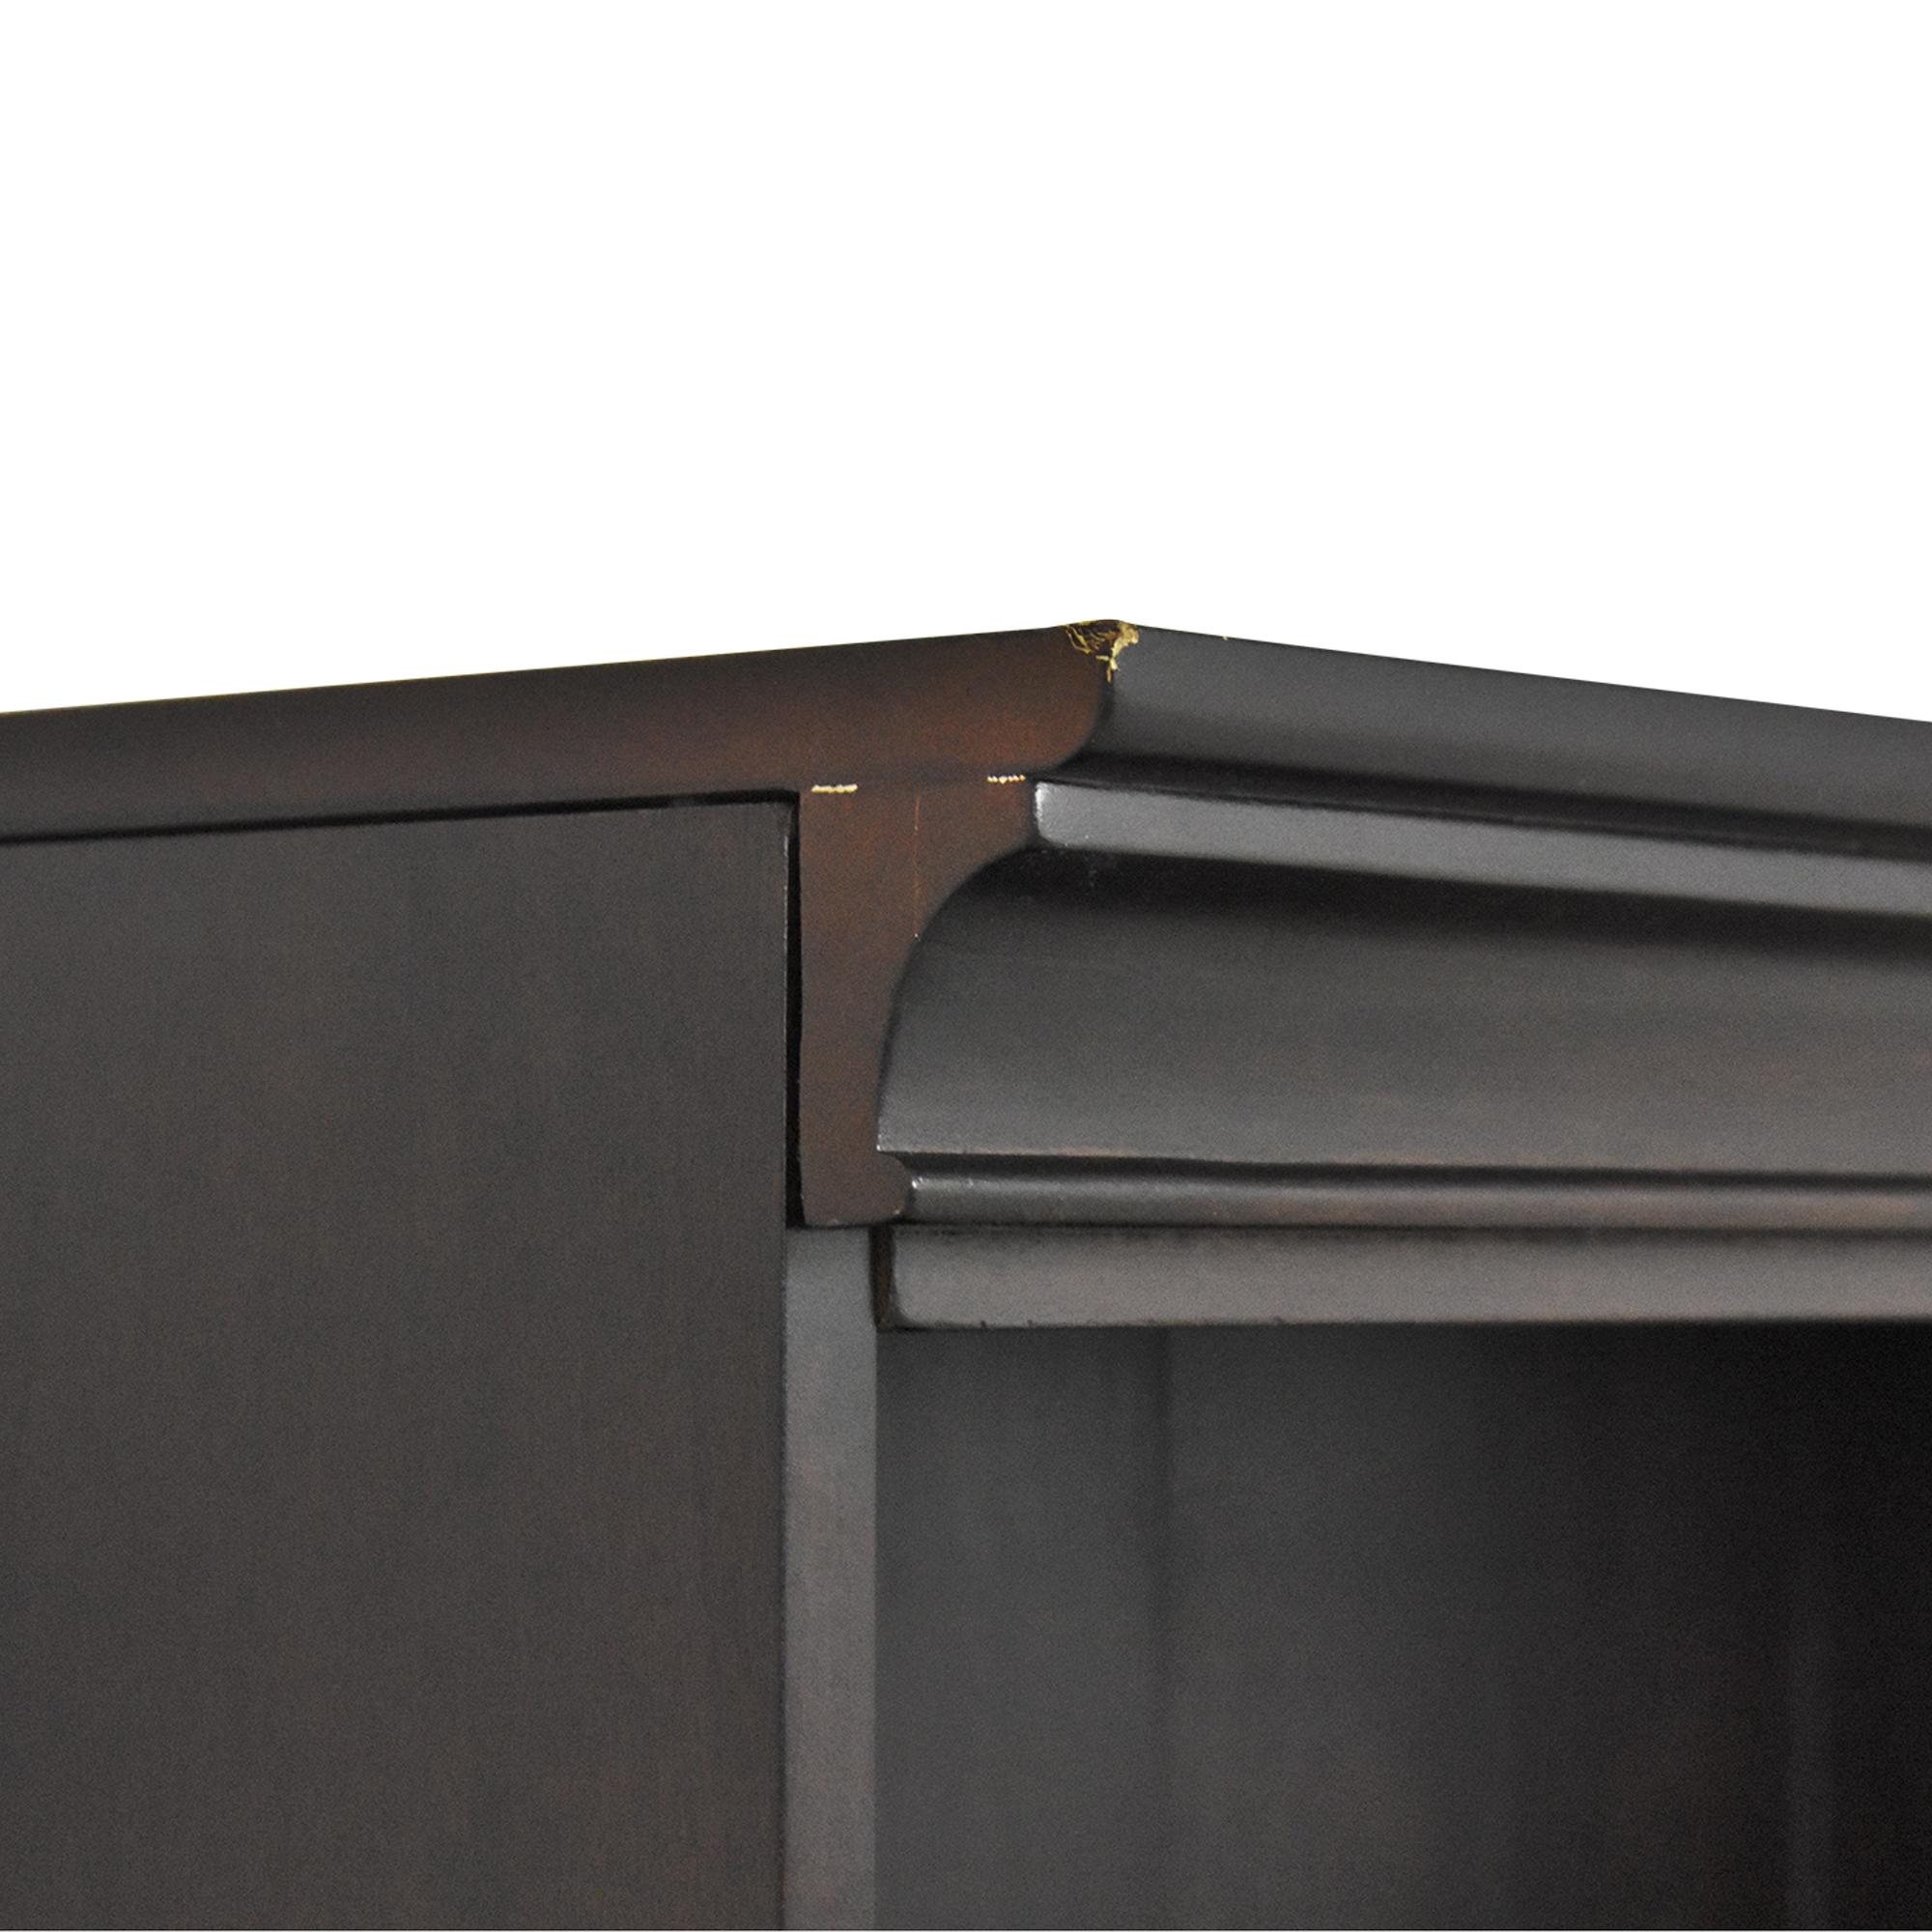 Raymour & Flanigan Raymour & Flanigan Large Bookcase used